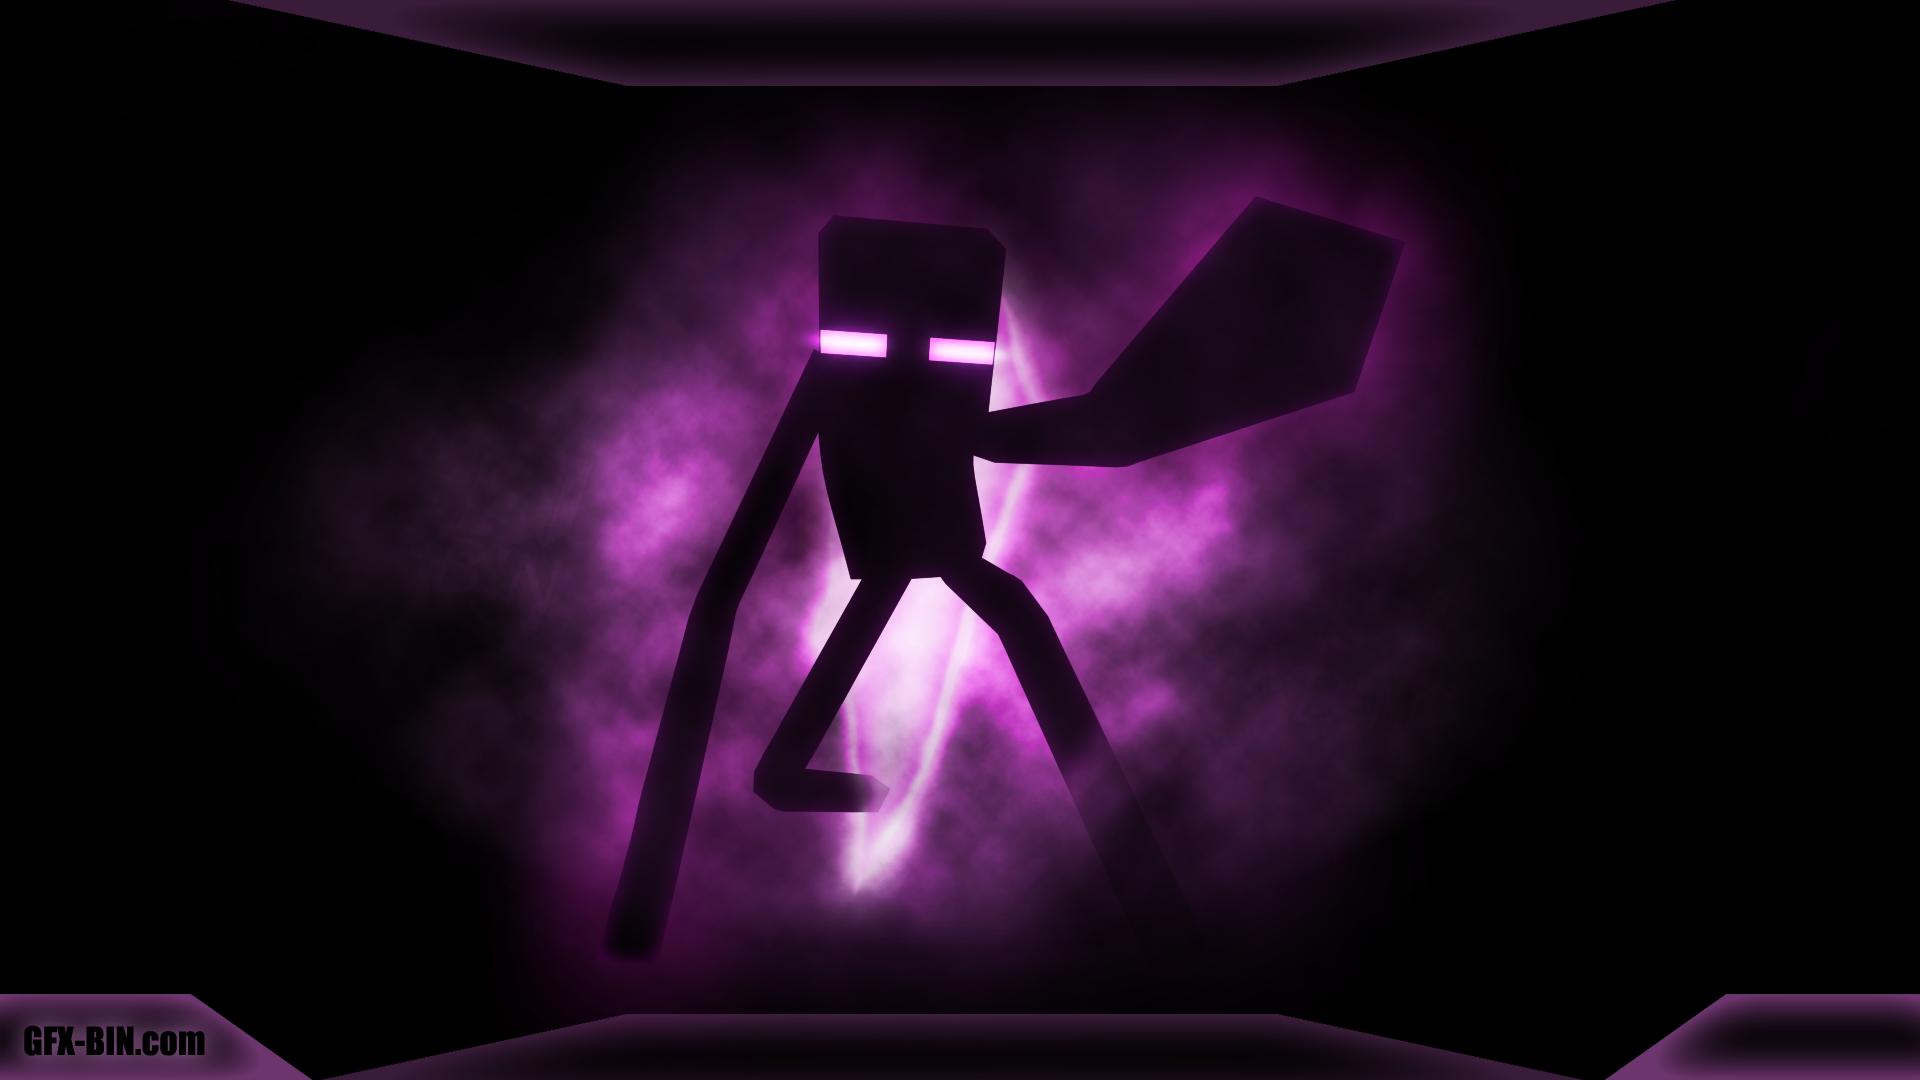 Good Wallpaper Minecraft Neon - enderman_wallpaper-(1920x1080)  Image_287338.png